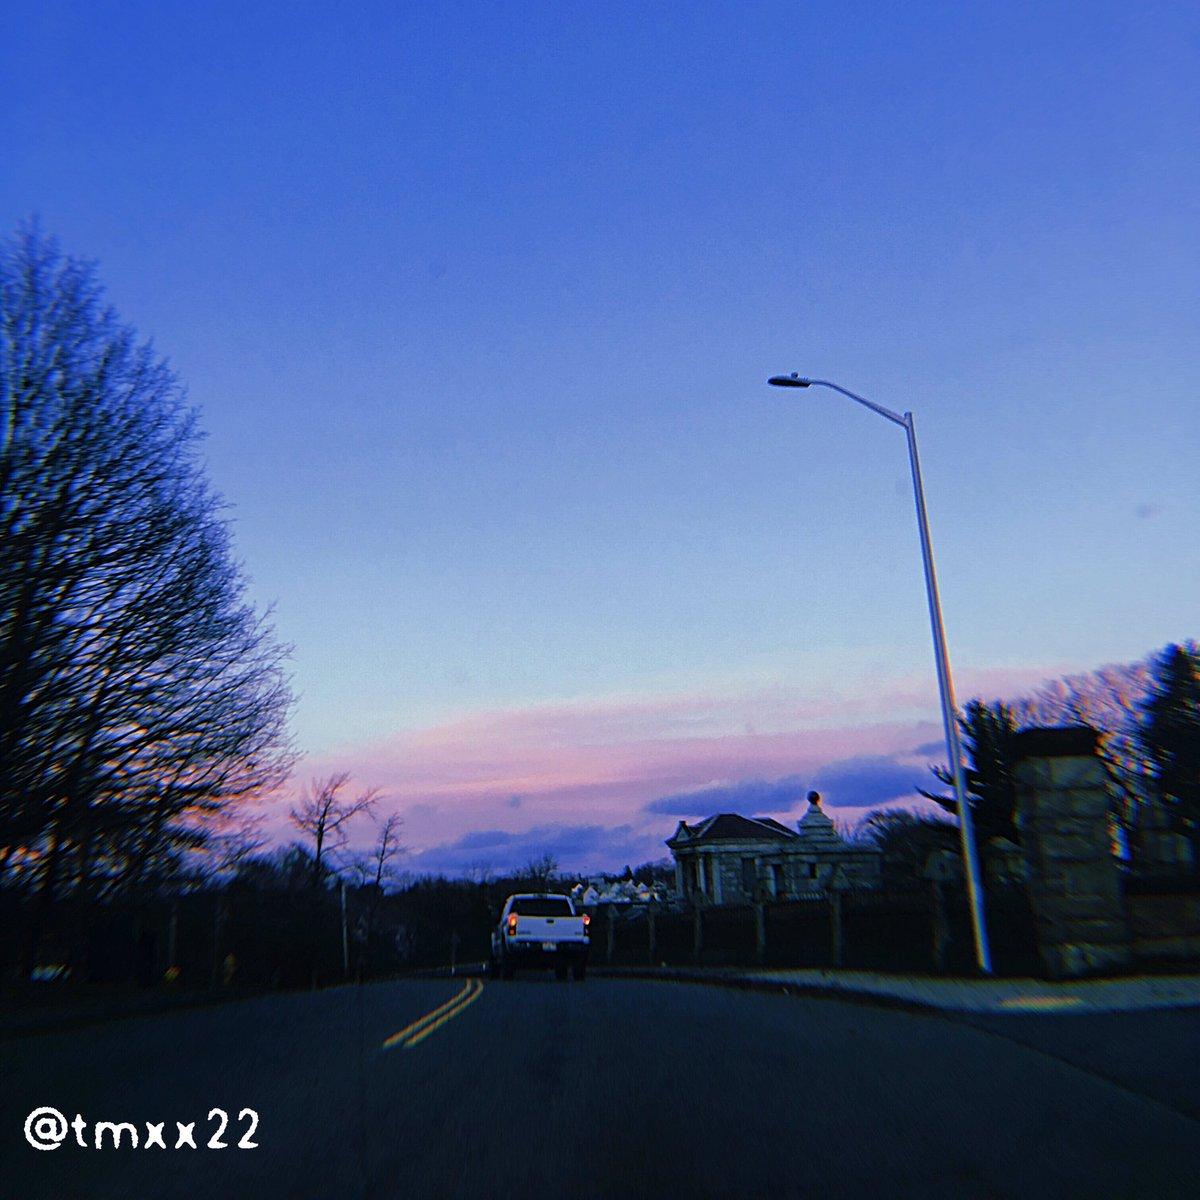 streets 2  #street #photo #photographer #photography #aesthetic #vaporwave #cars #lofi #huji #sunset #sky #road